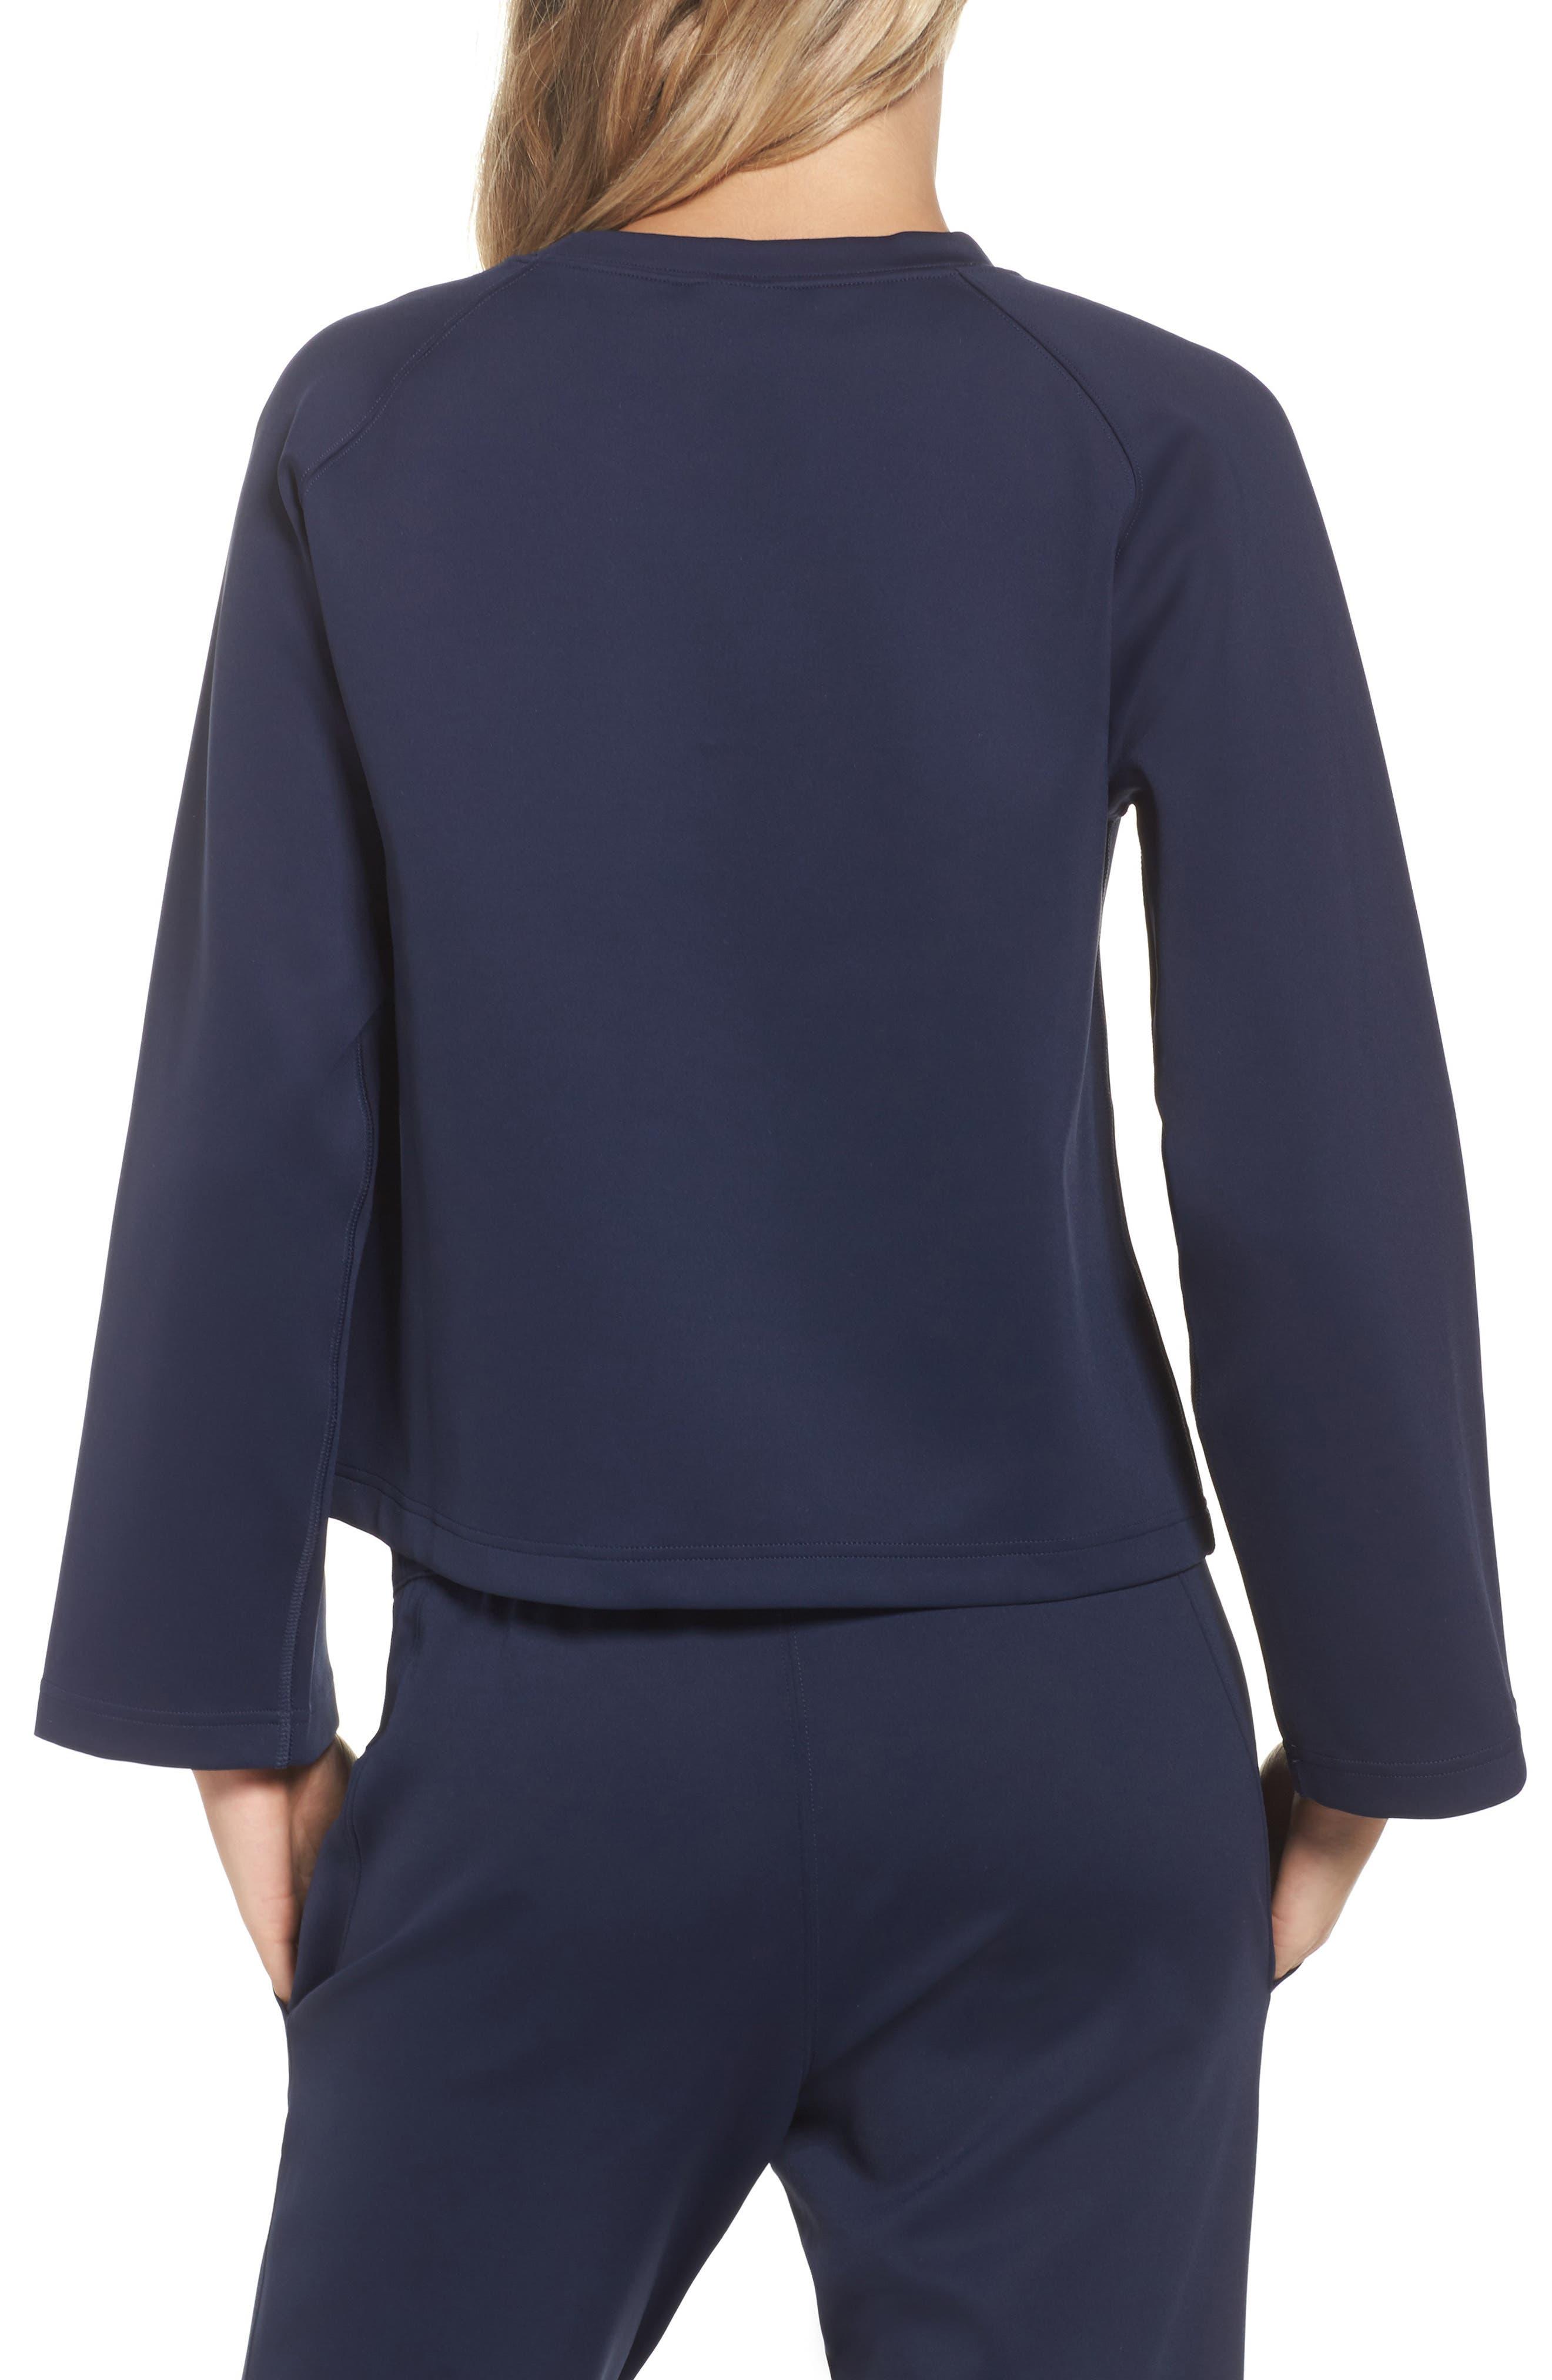 NikeLab Essentials Women's Fleece Top,                             Alternate thumbnail 4, color,